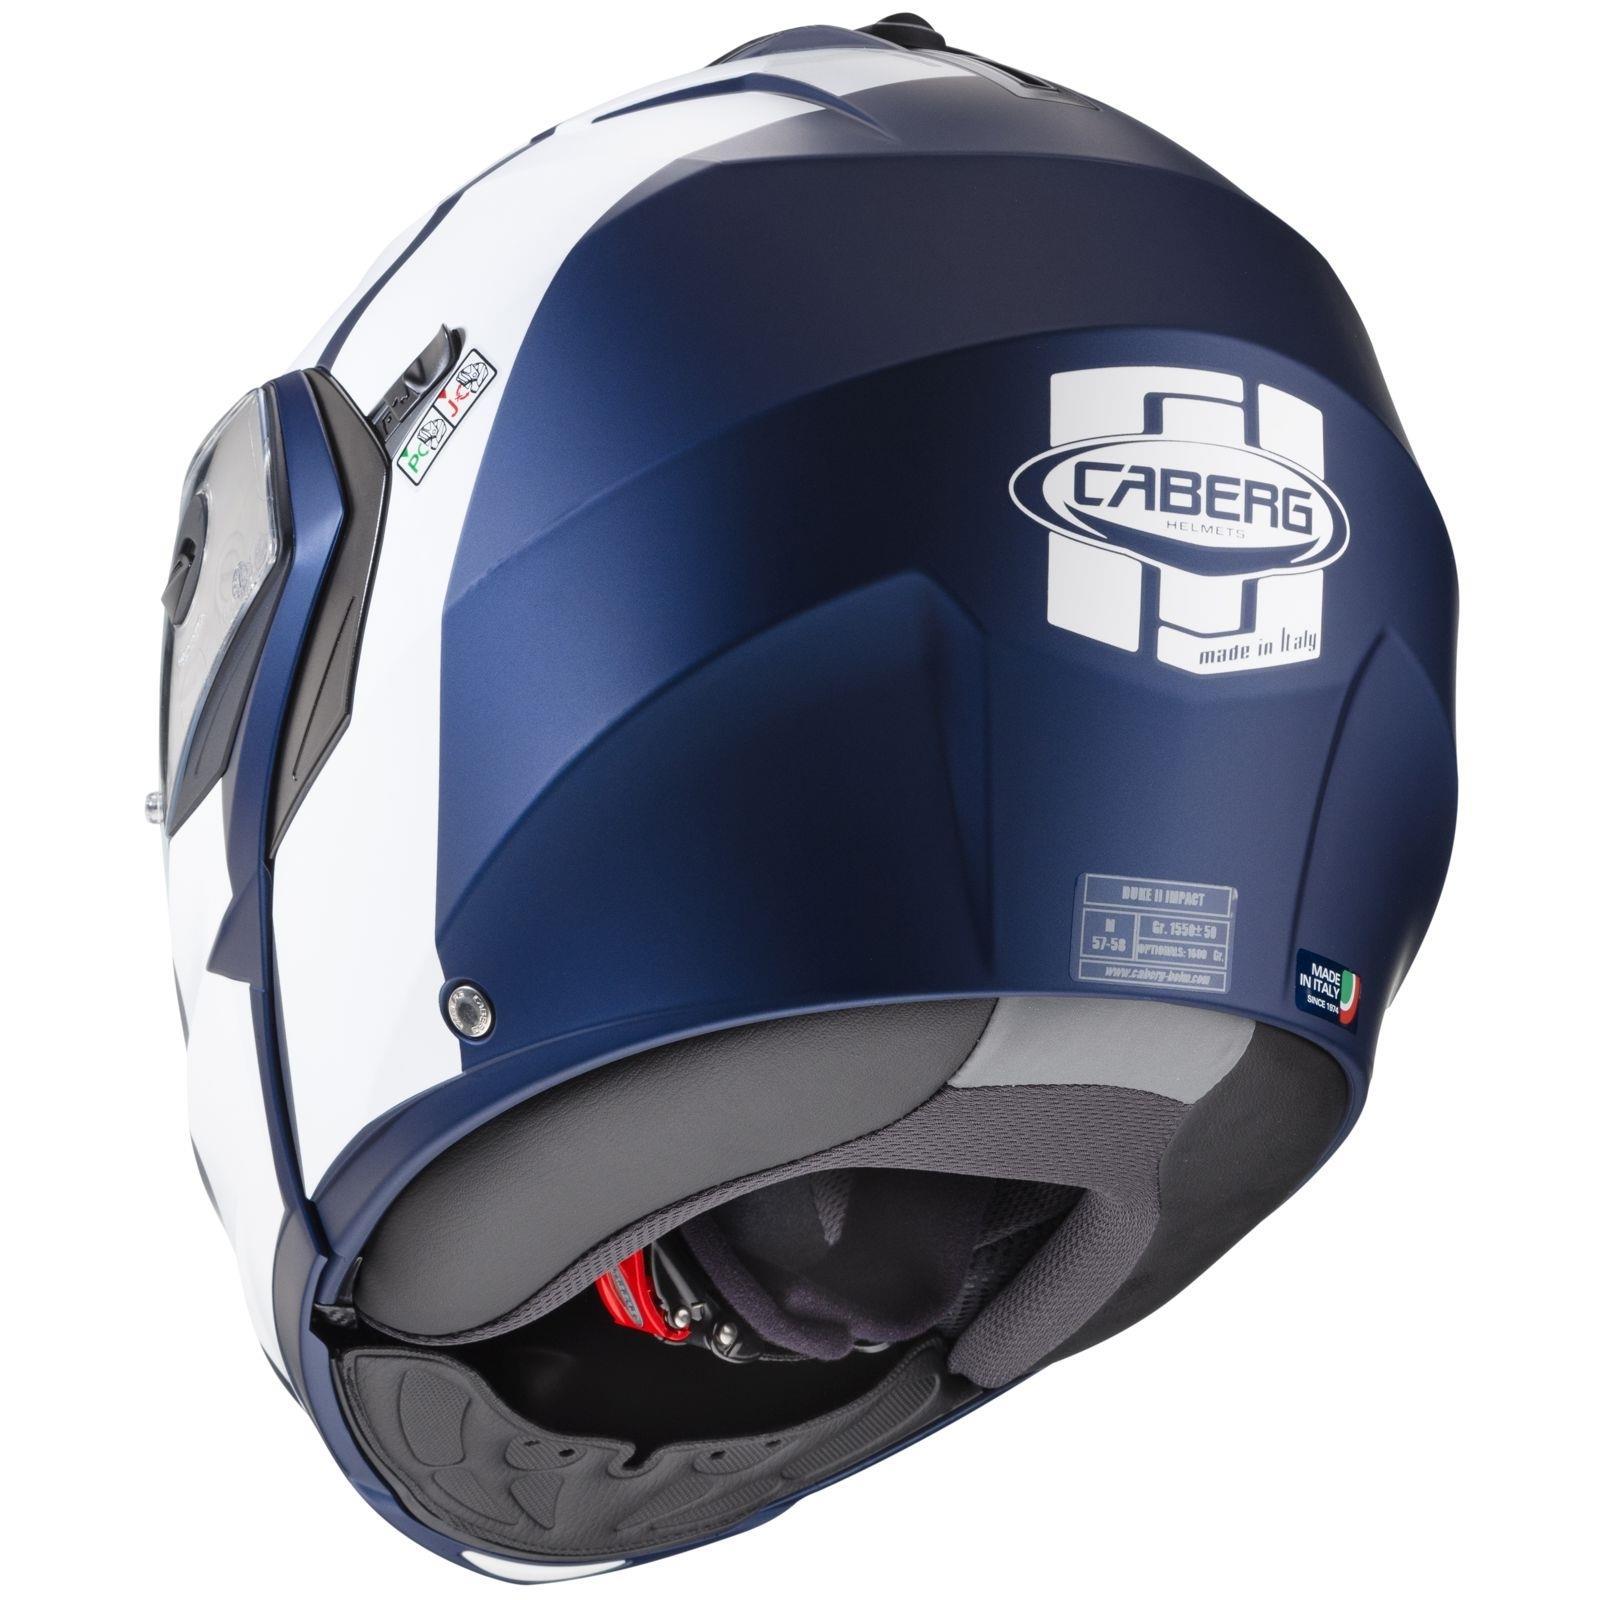 Caberg-Klapp-Helm-Duke-II-2-Motorrad-Belueftet-Sonnenblende-Pinlock-Visier-Jet Indexbild 16